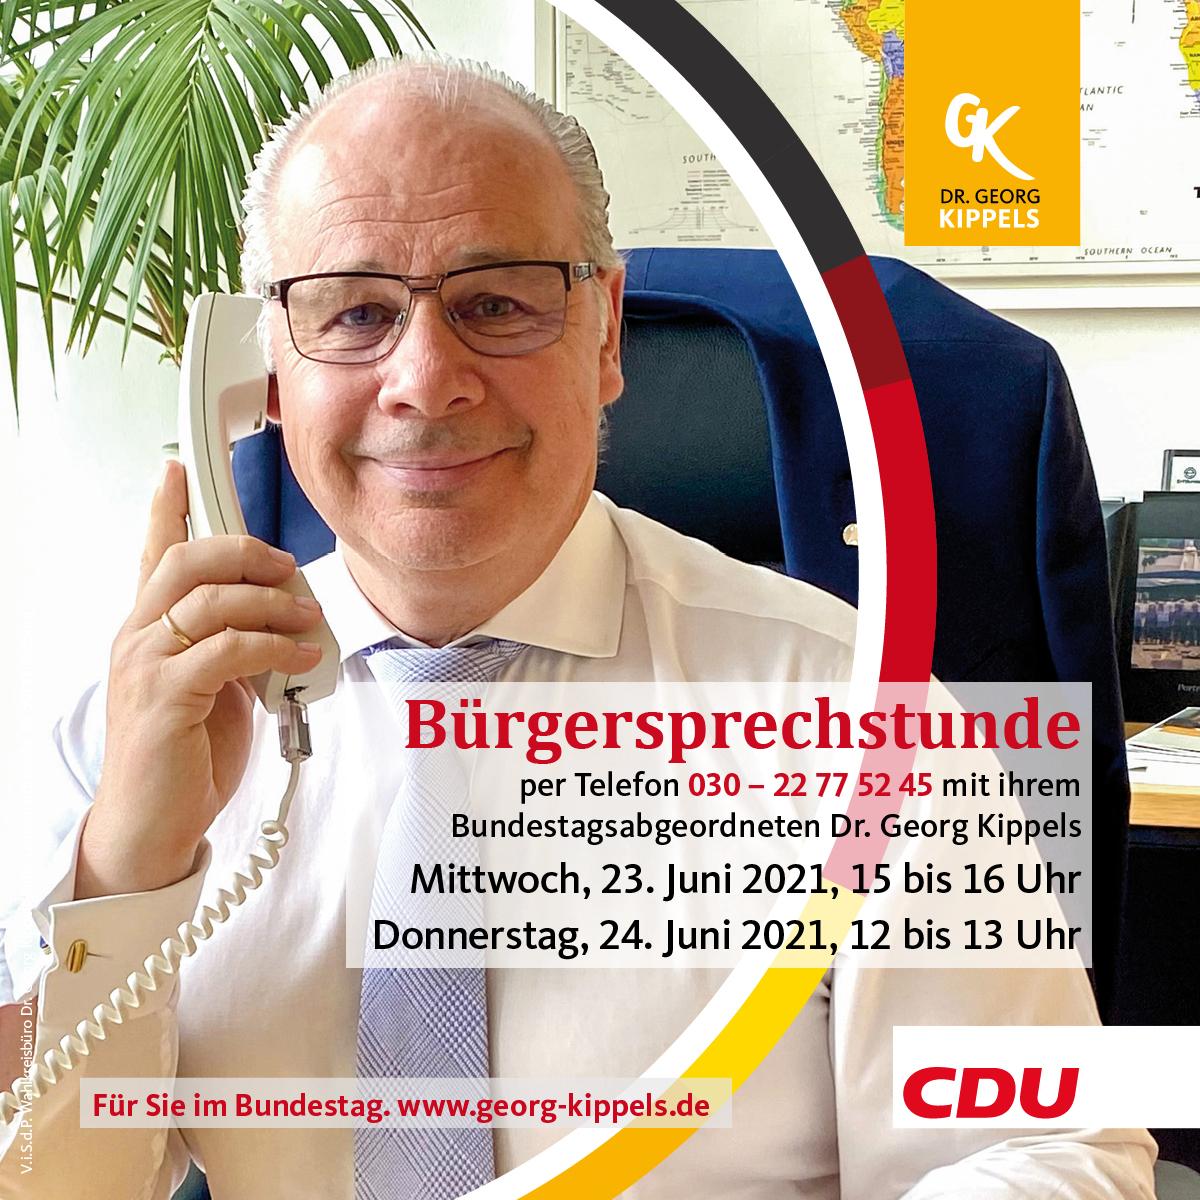 210623-24_Buergersprechstunde_1200x1200_fb_ig_Berlin